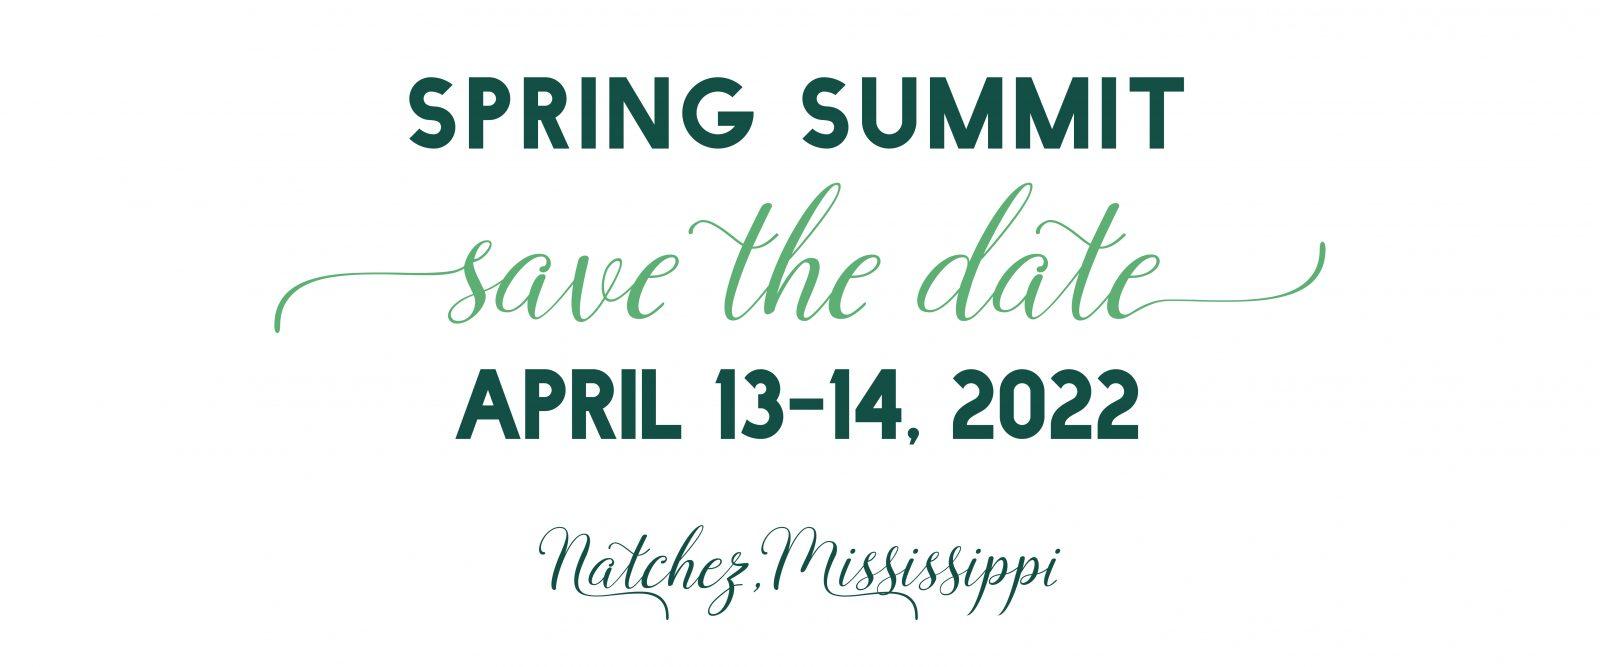 2022 Spring Summit